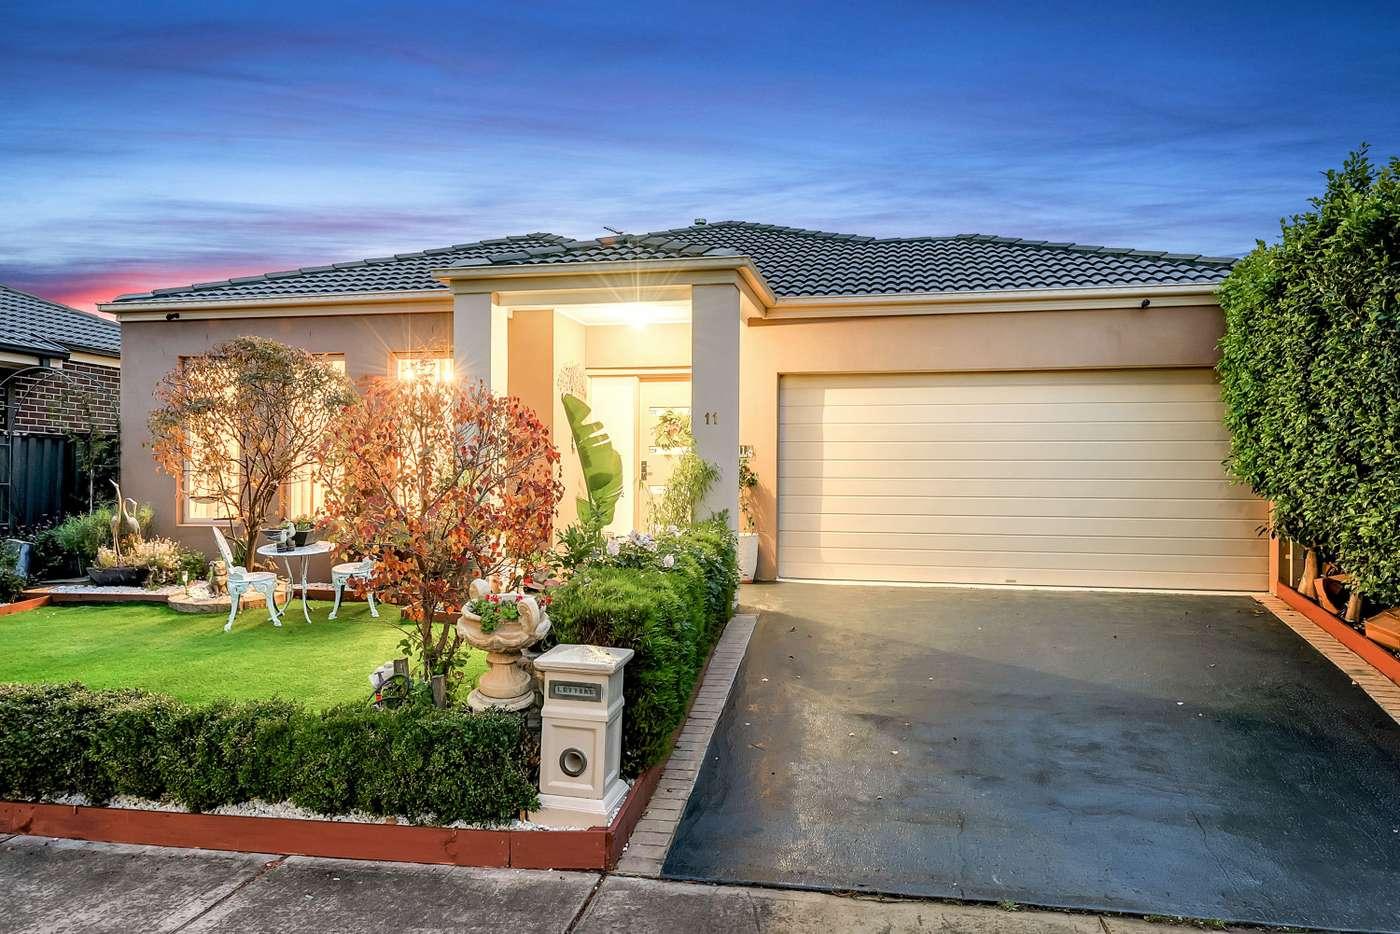 Main view of Homely house listing, 11 Fairhaven Boulevard, Craigieburn VIC 3064